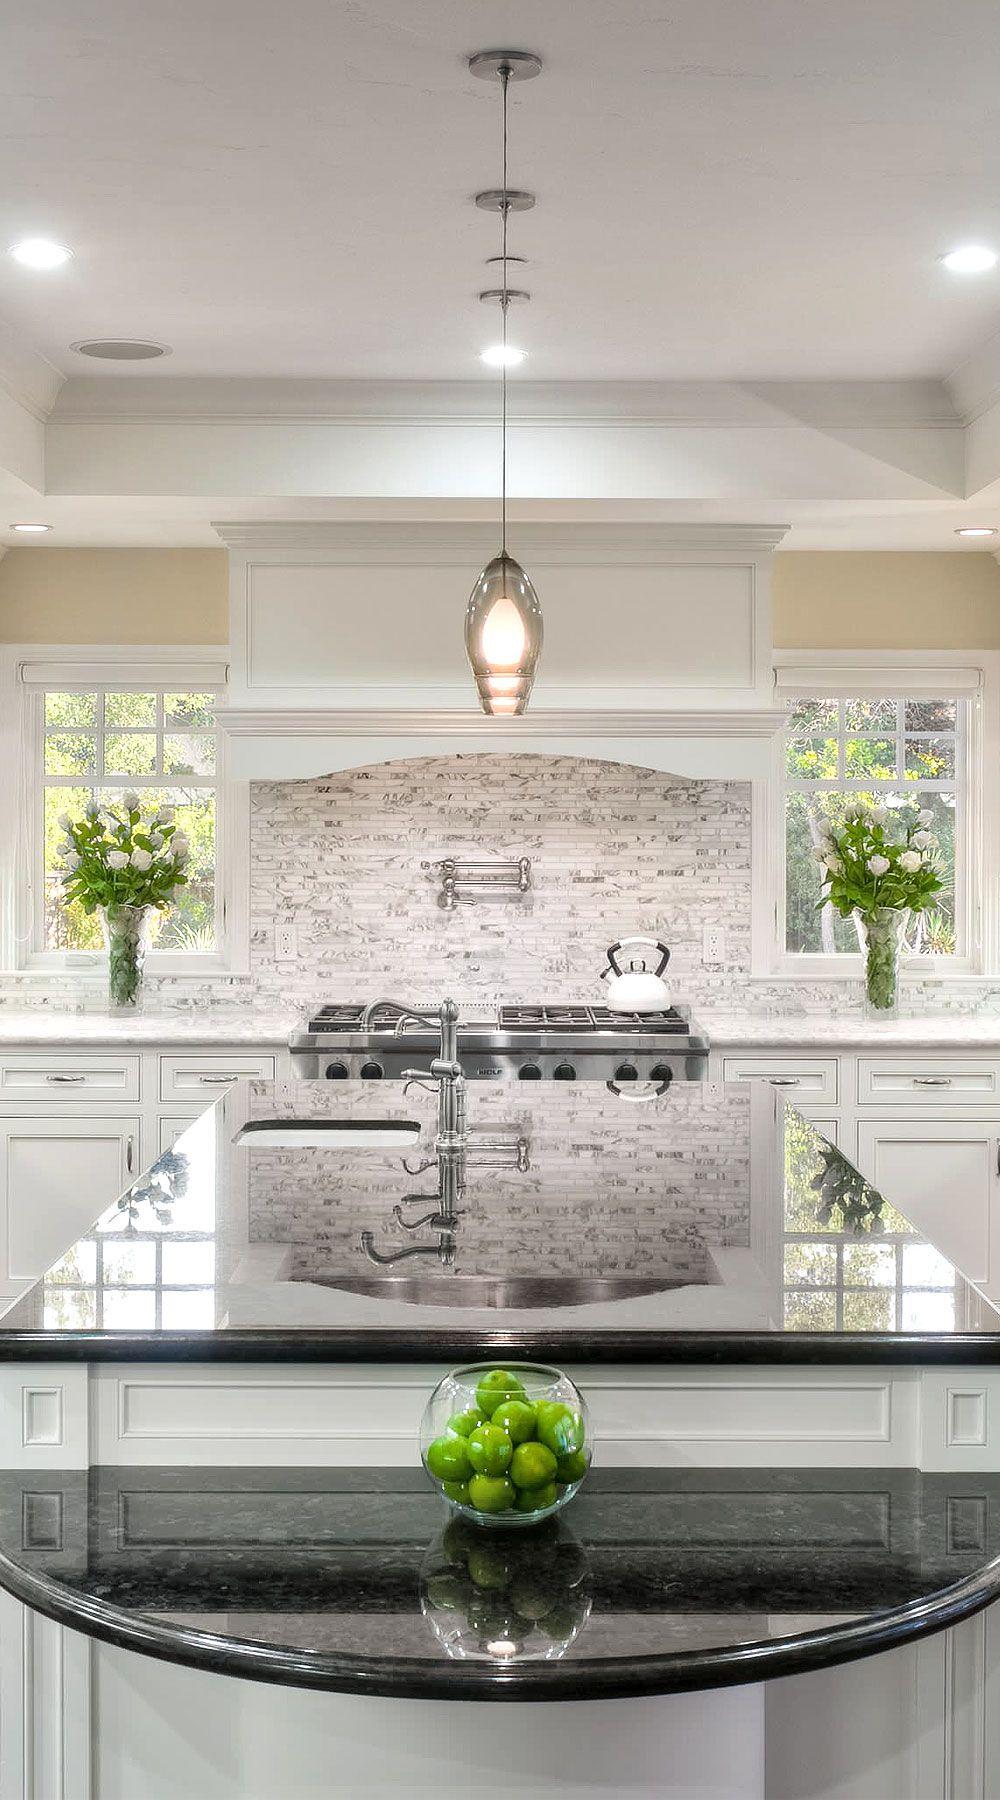 50+ Black Countertop Backsplash Ideas (Tile Designs, Tips ... on Backsplash Ideas For Dark Granite Countertops  id=93855